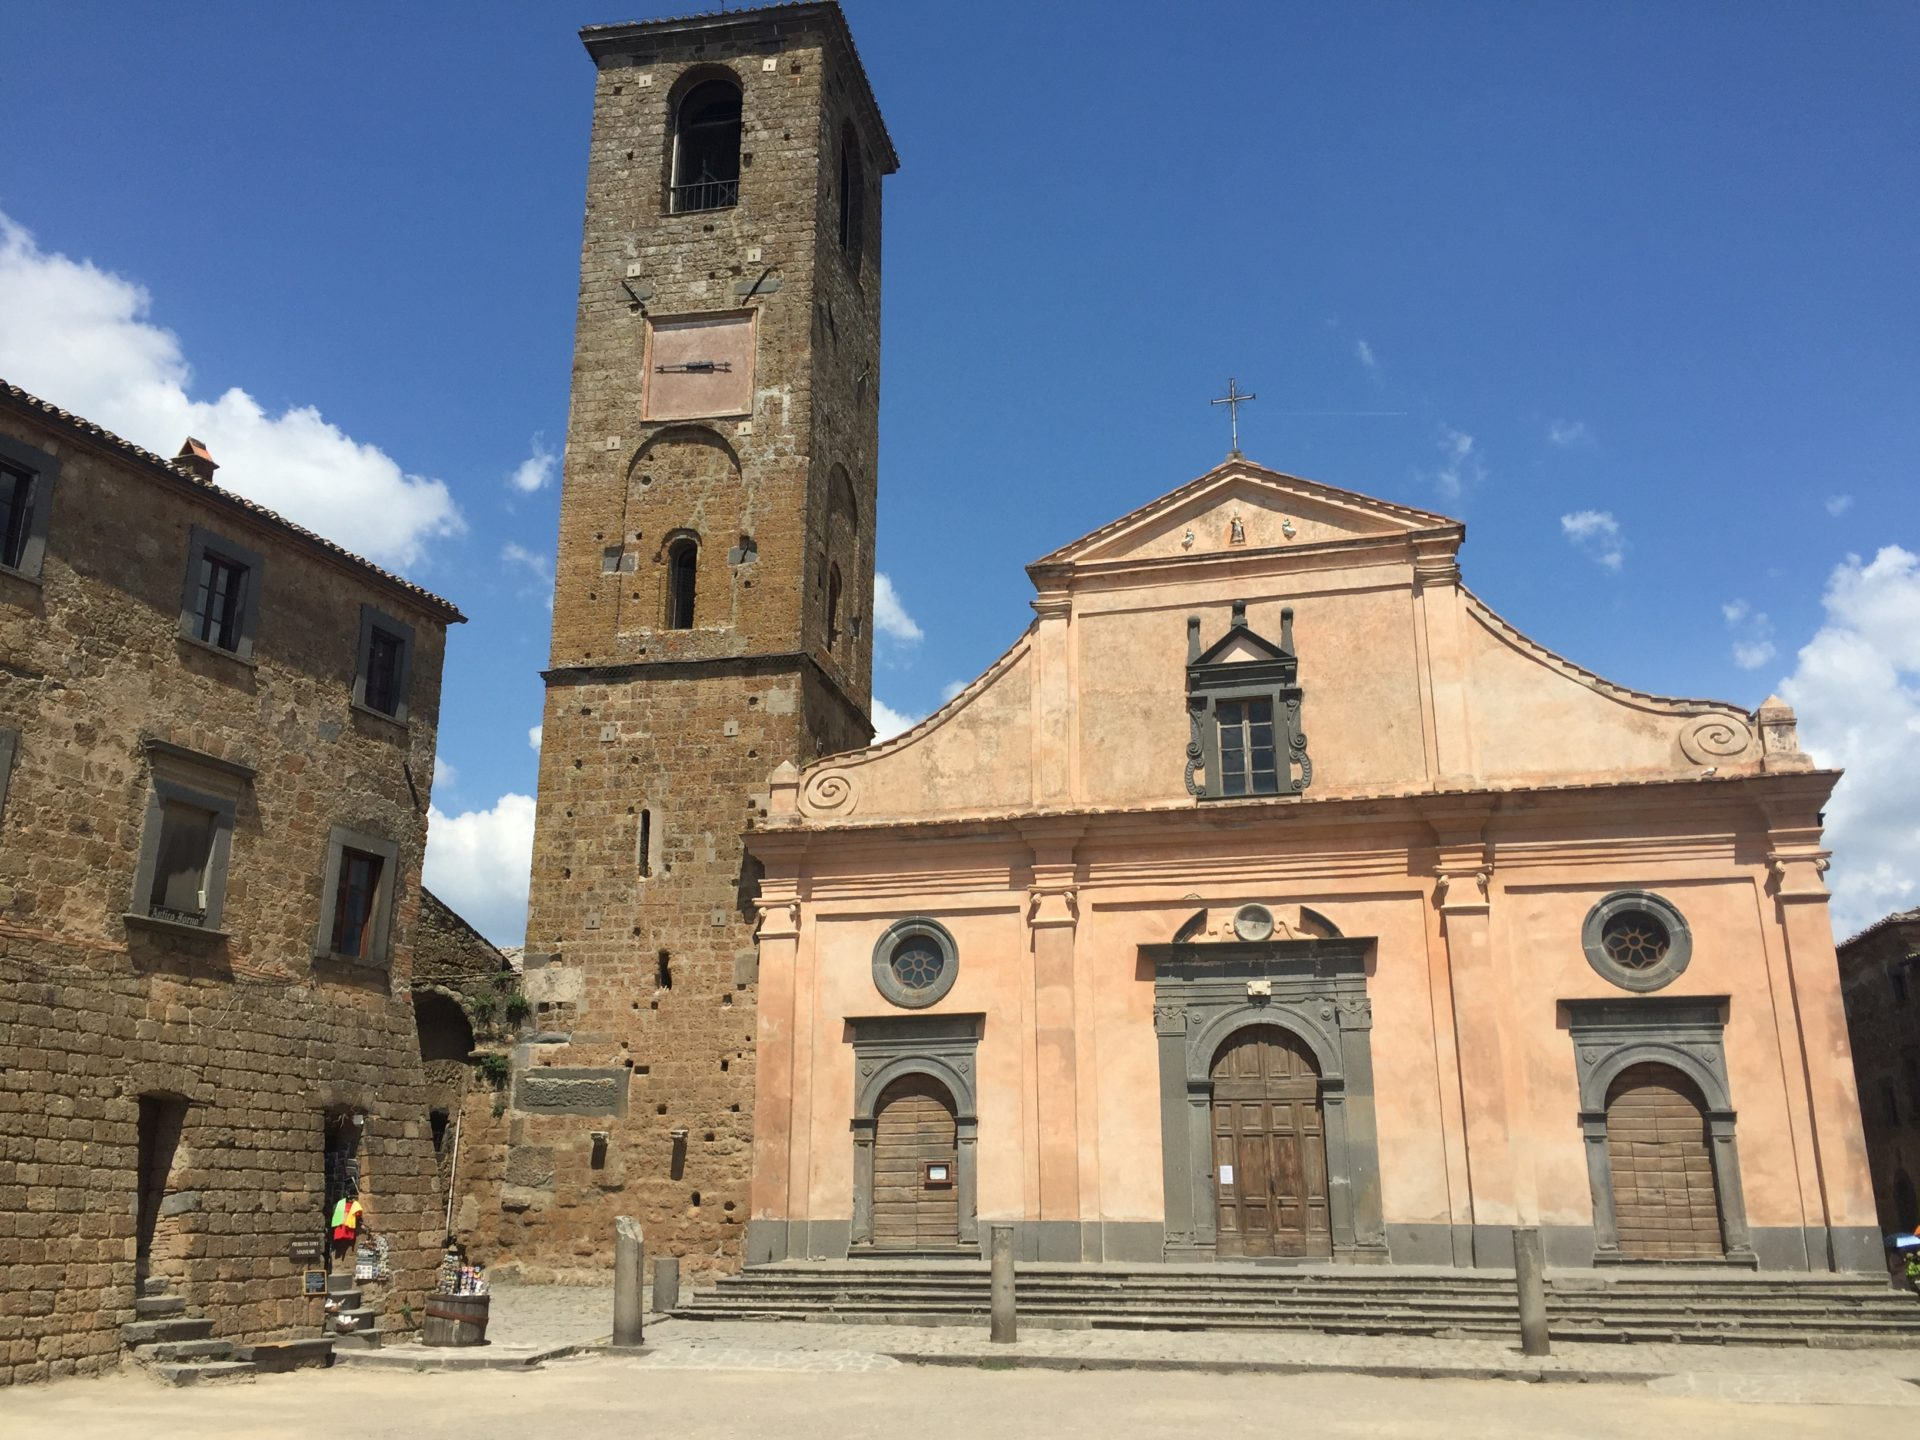 "<img src=""http://marenostrum.pl/wp-content/uploads//2019/09/San-Donato-Bagnoregio.jpeg"" alt=""Kościół Civita di Bagnoregio"" />"